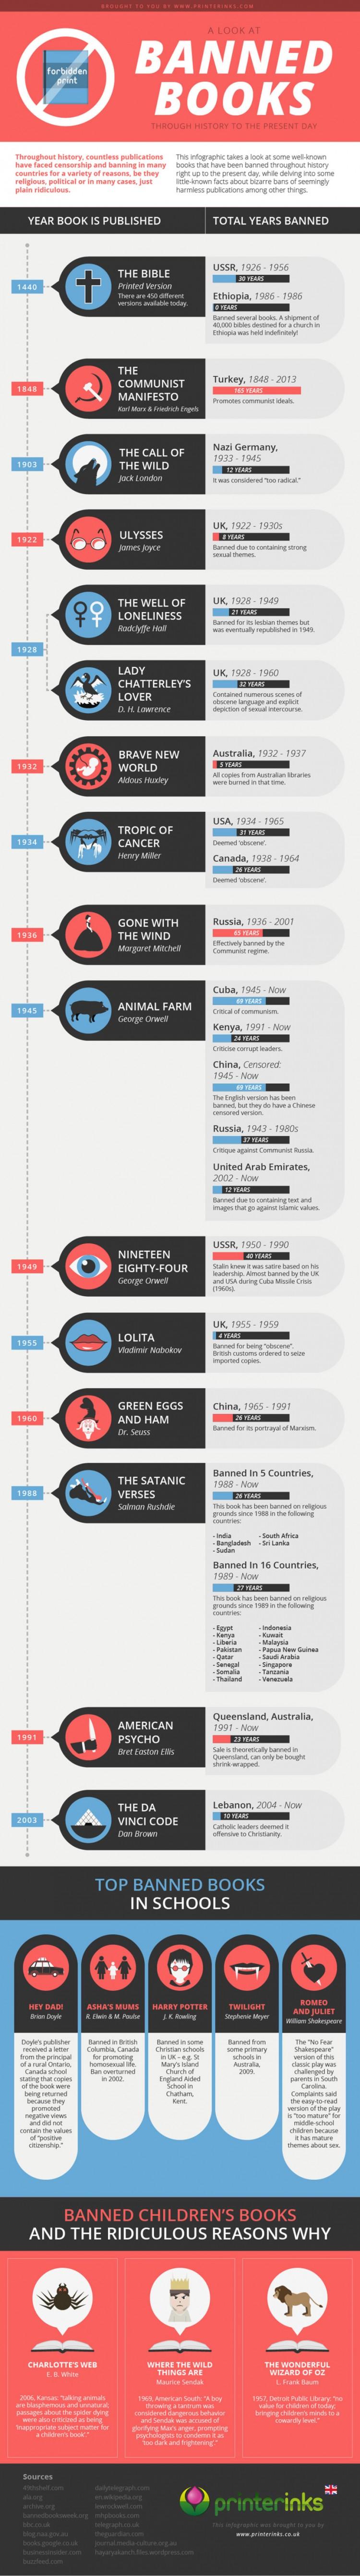 libros-censurados-infografia